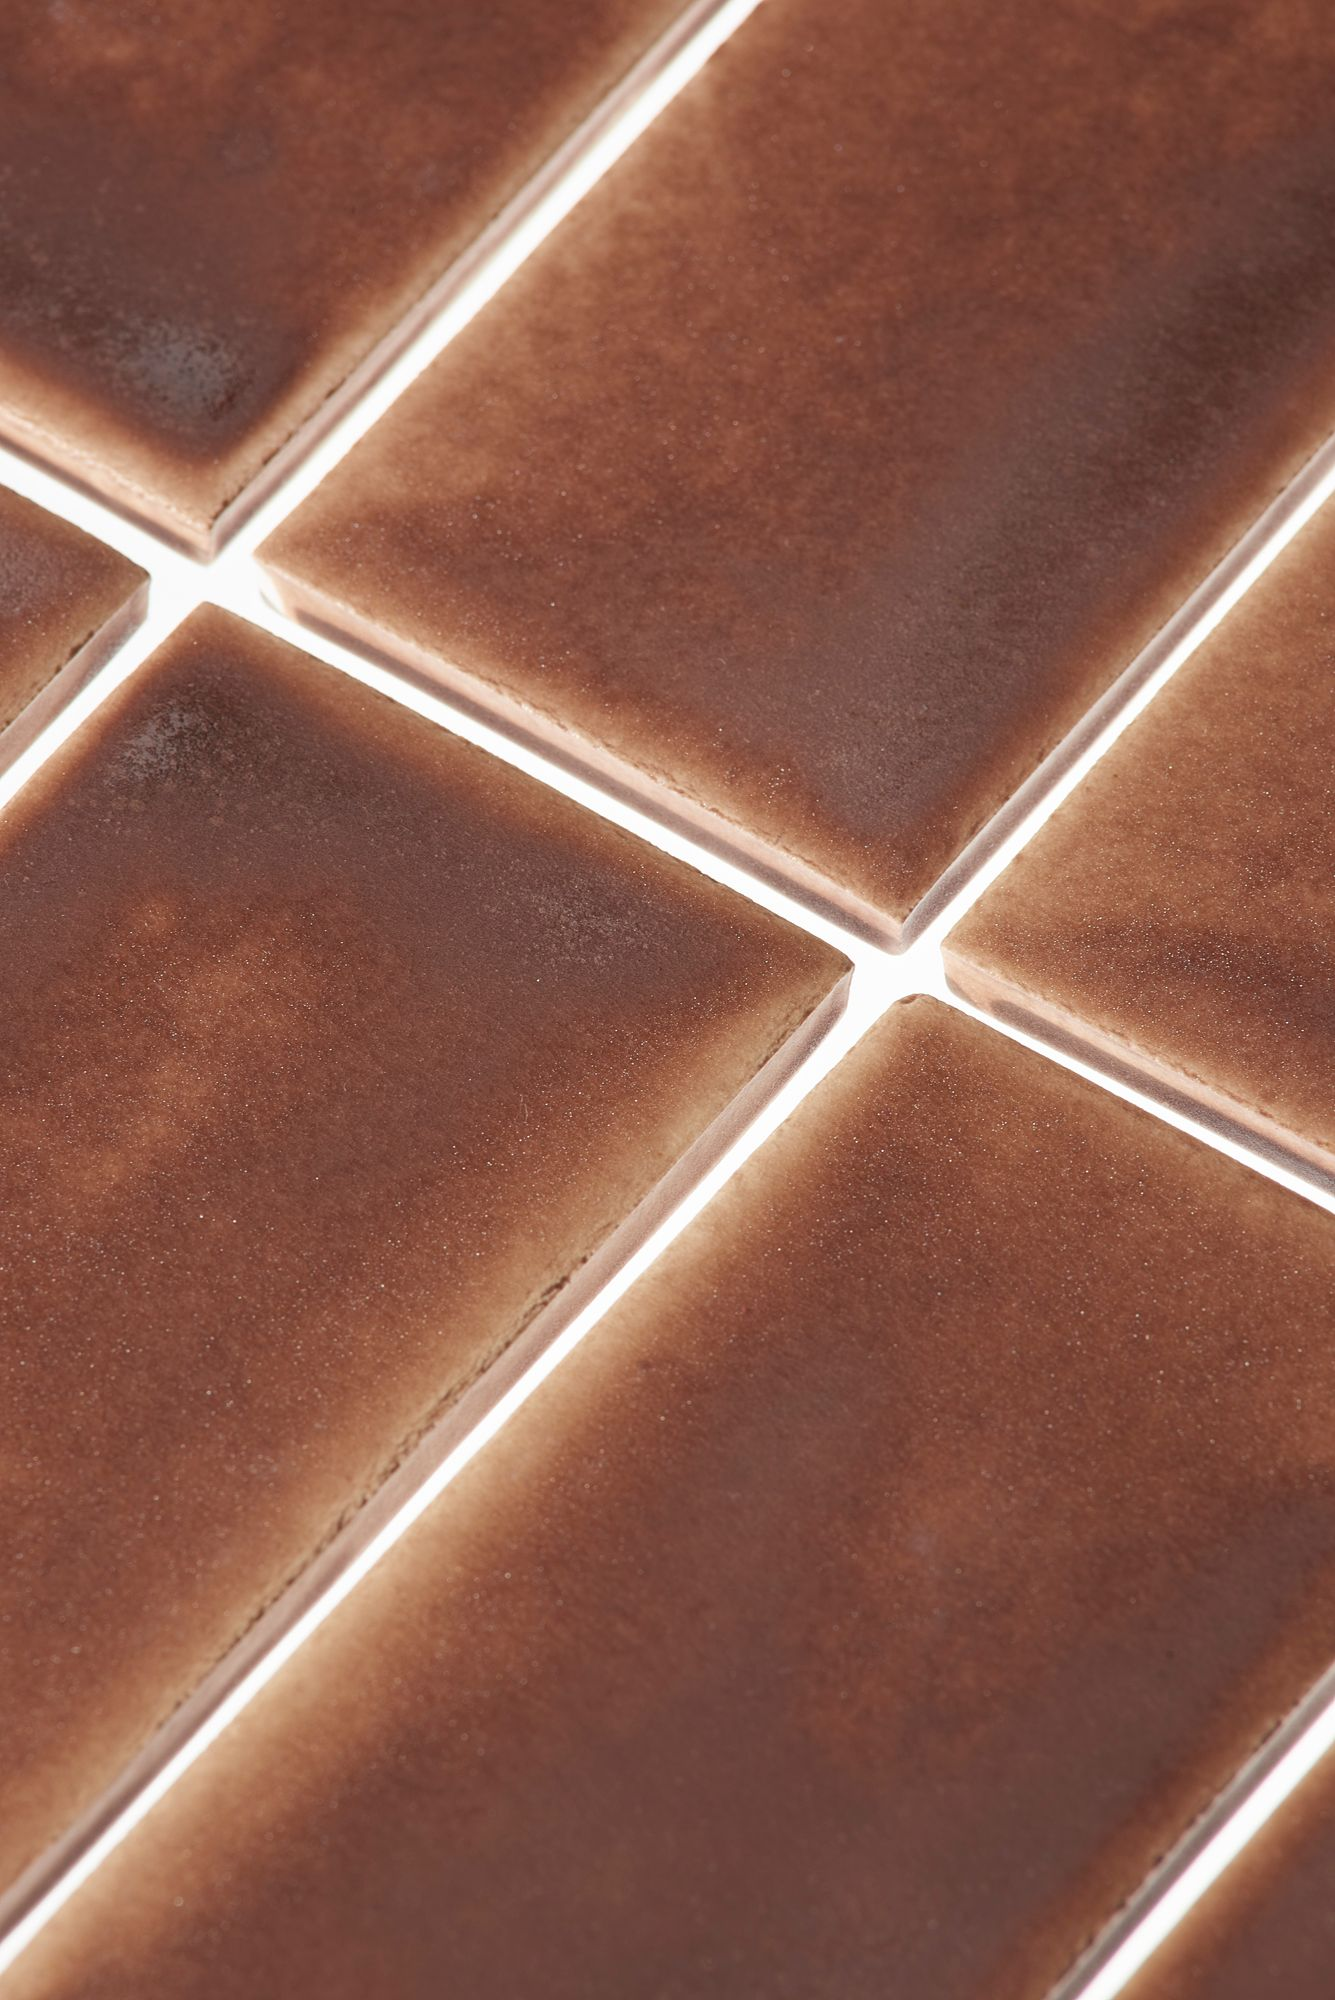 MN5SM_2 Manganese Waste Glazed Tiles